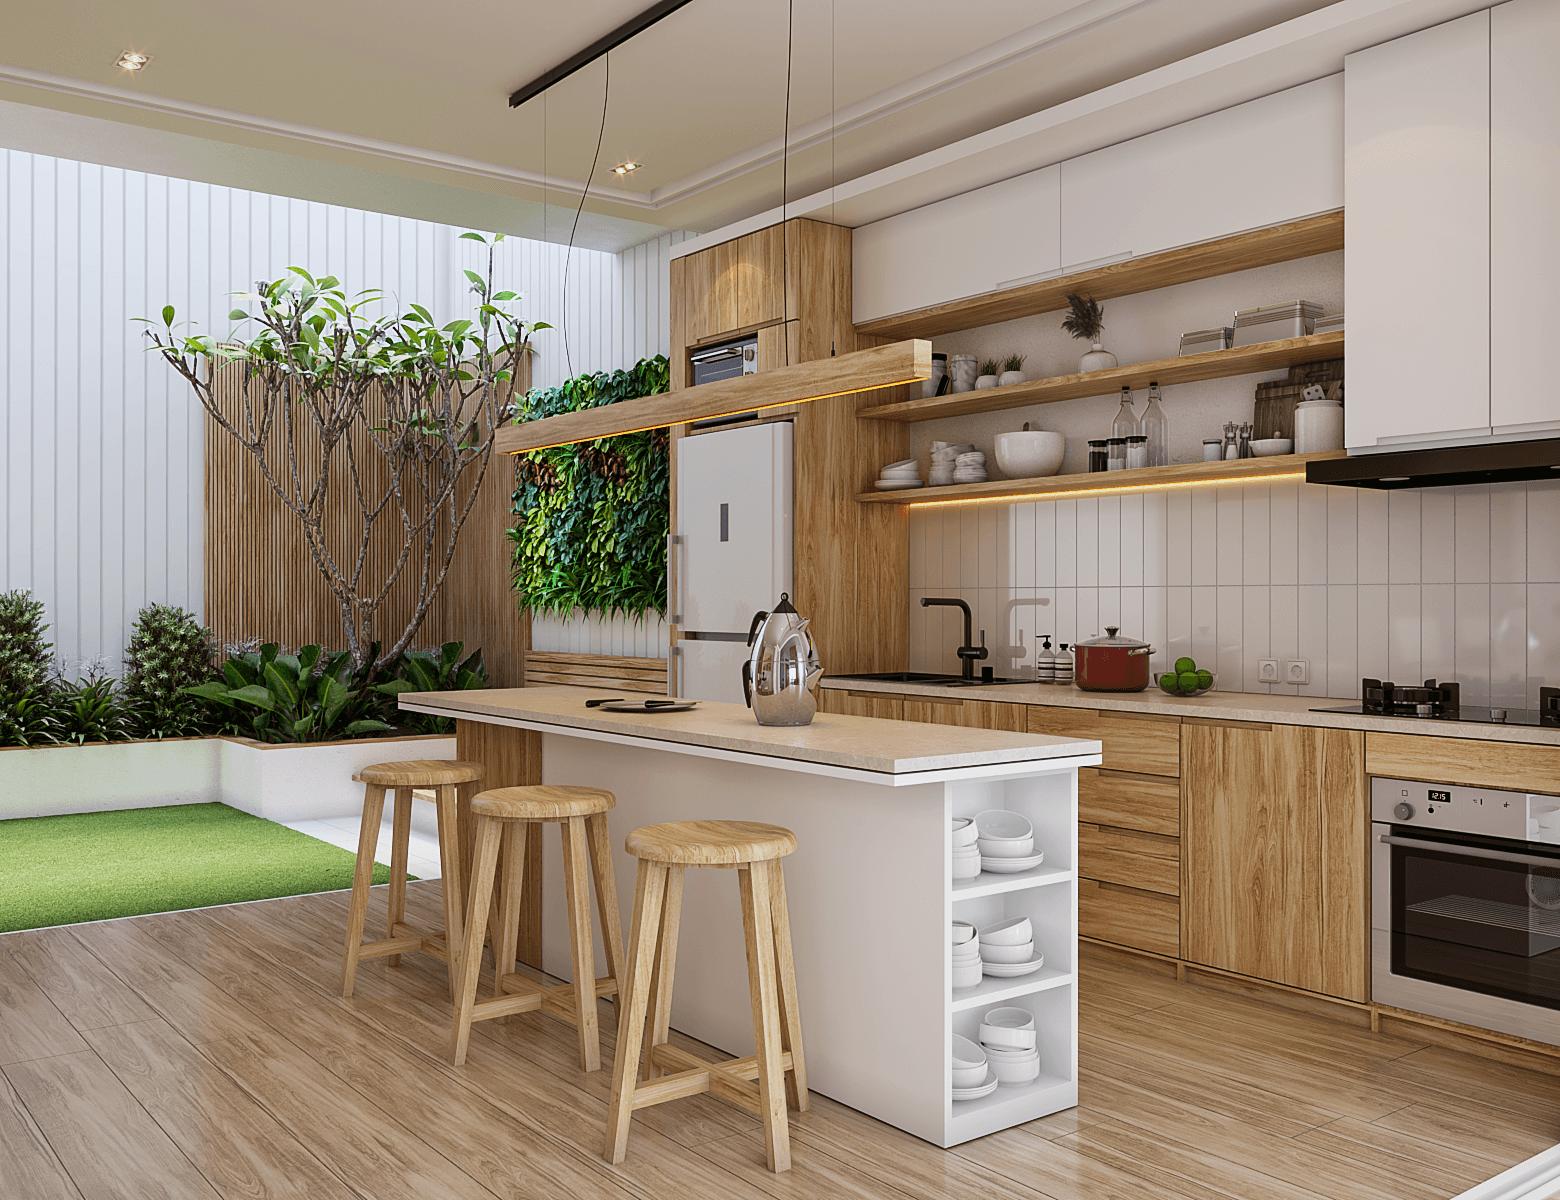 interior dapur minimalis dengan meja dapur kayu